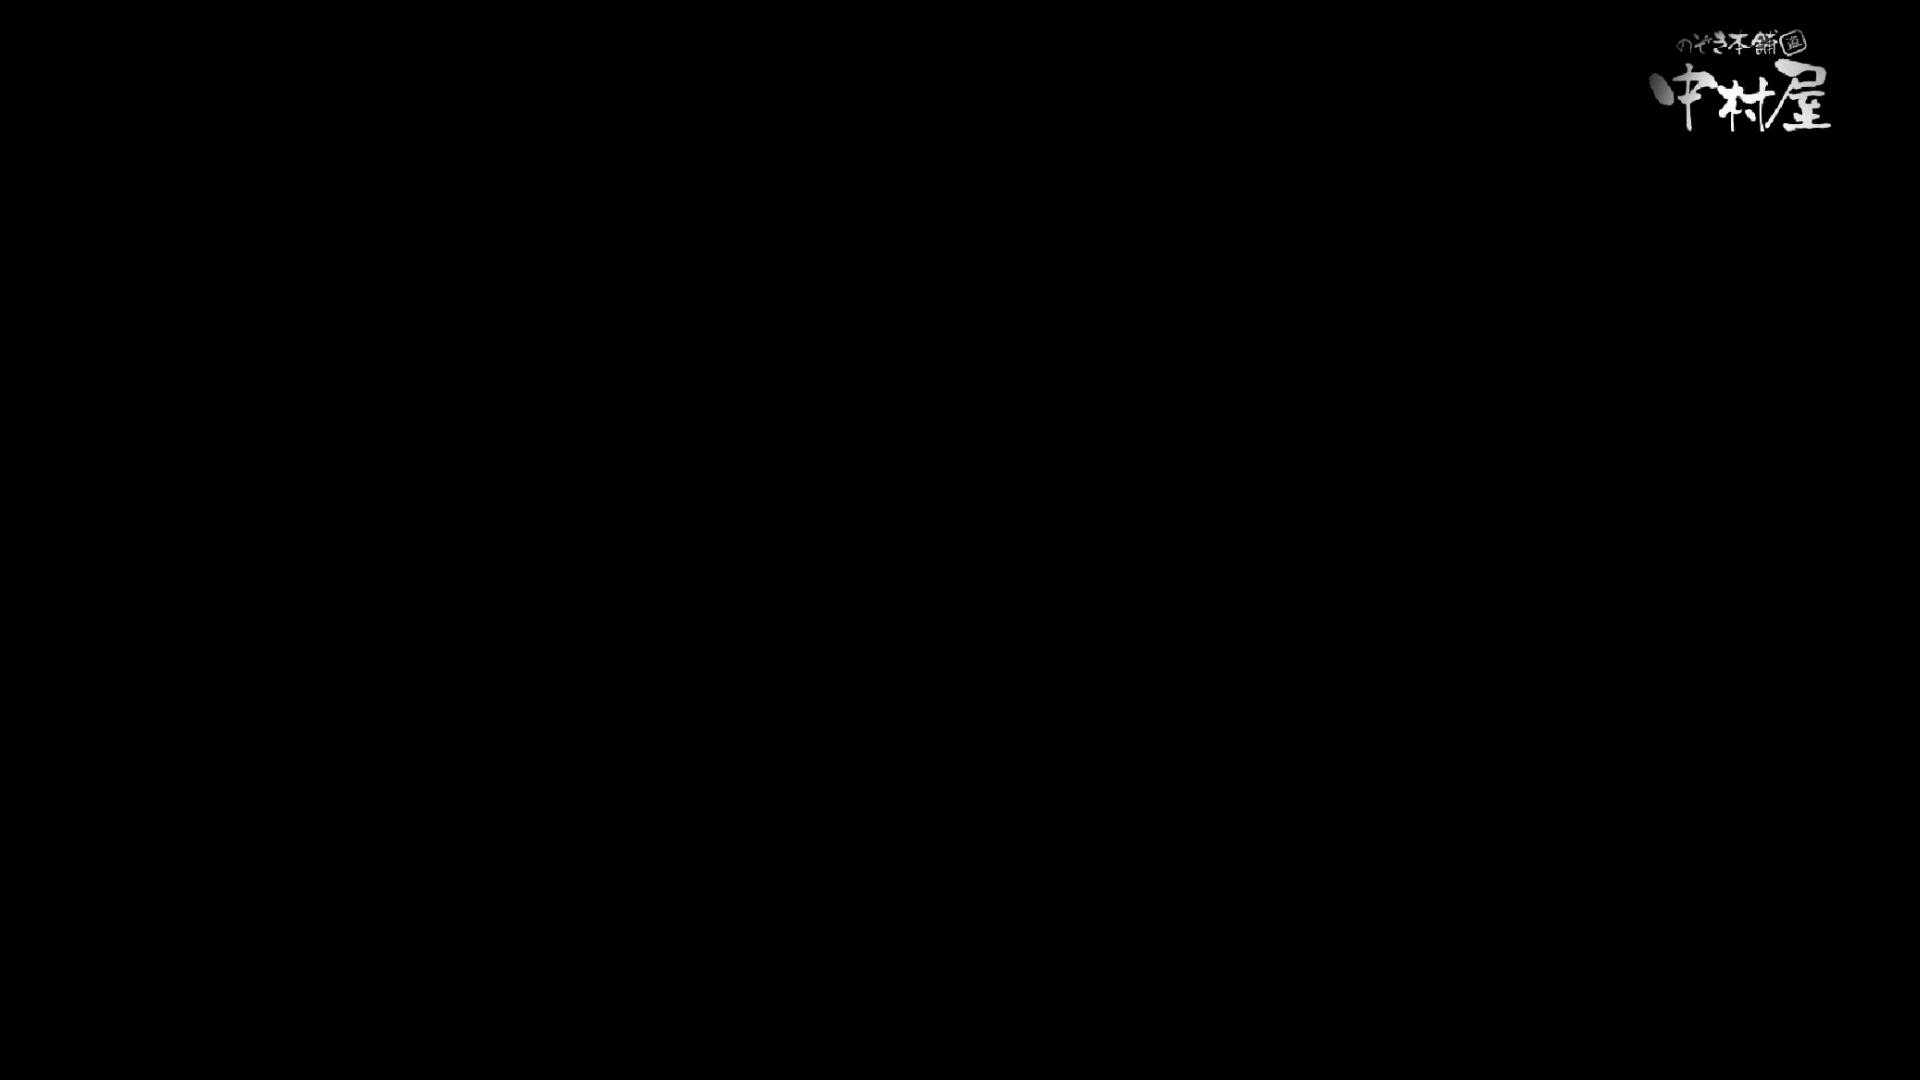 GOD HAND 芸術大学盗撮‼vol.110 OLエロ画像 | 盗撮  85PICs 17